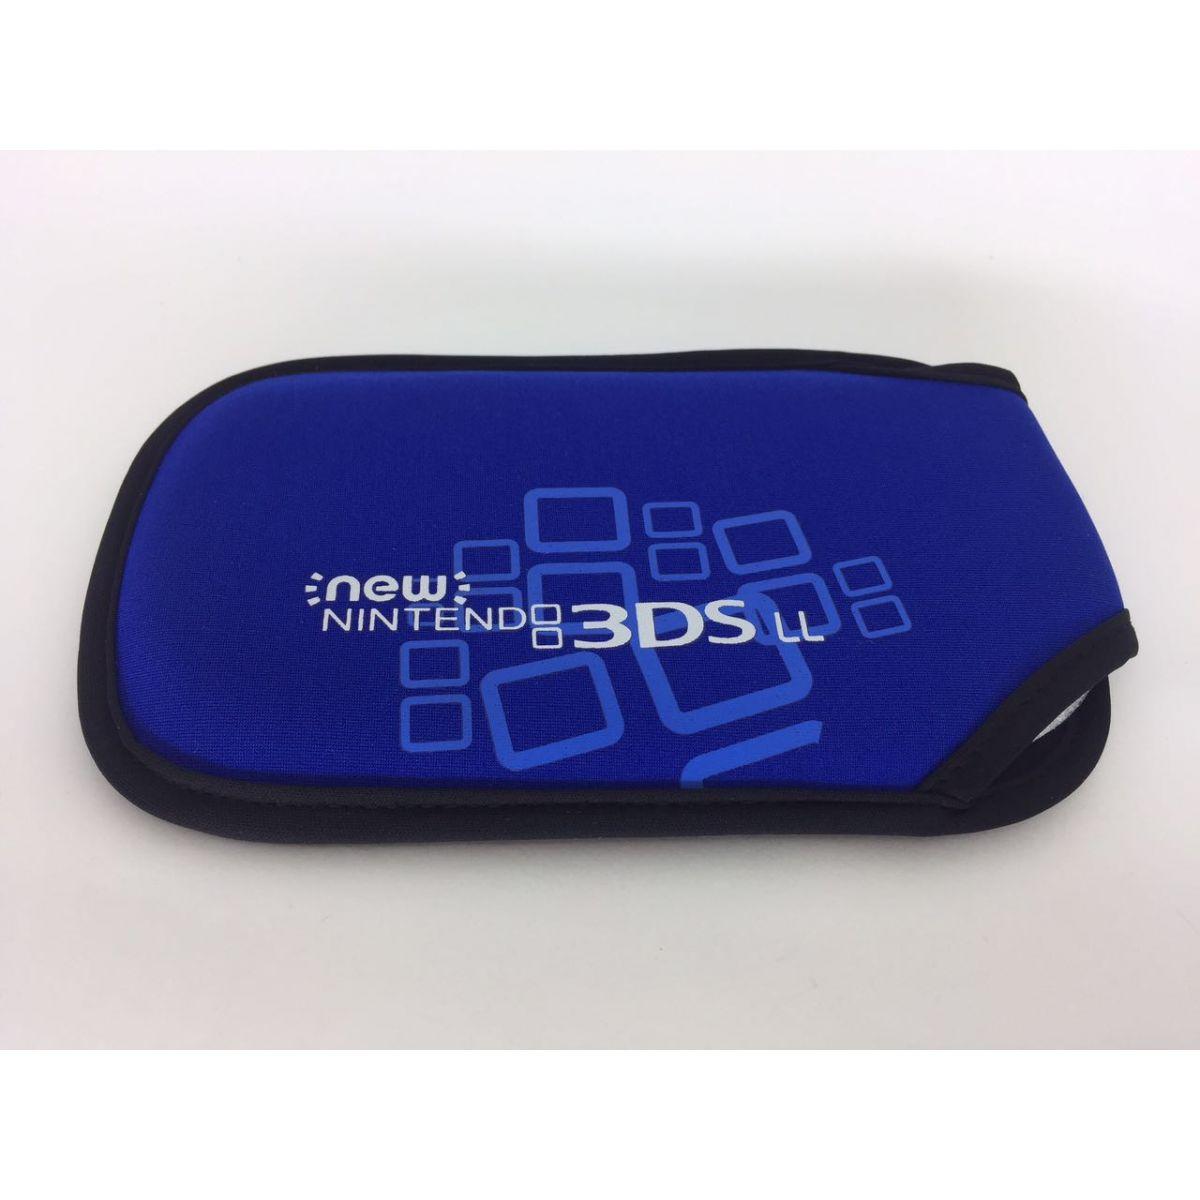 Estojo Capa de Neoprene para Nintendo 3DS , 3DS XL, NEW 3DS, NEW 3DS XL, DS - Azul